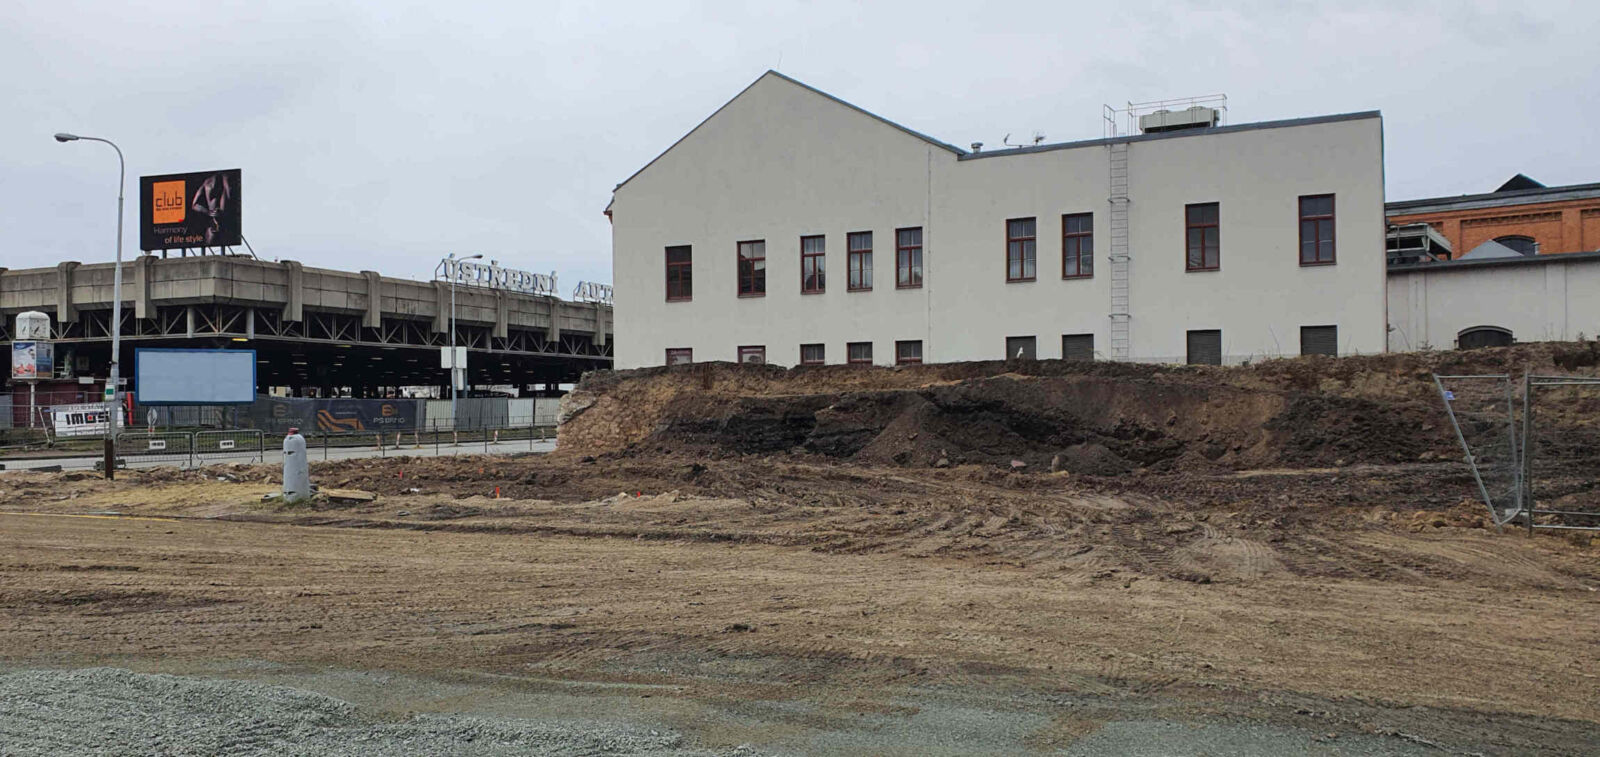 Zbytek žel. náspu u Vaňkovky, únor 2020